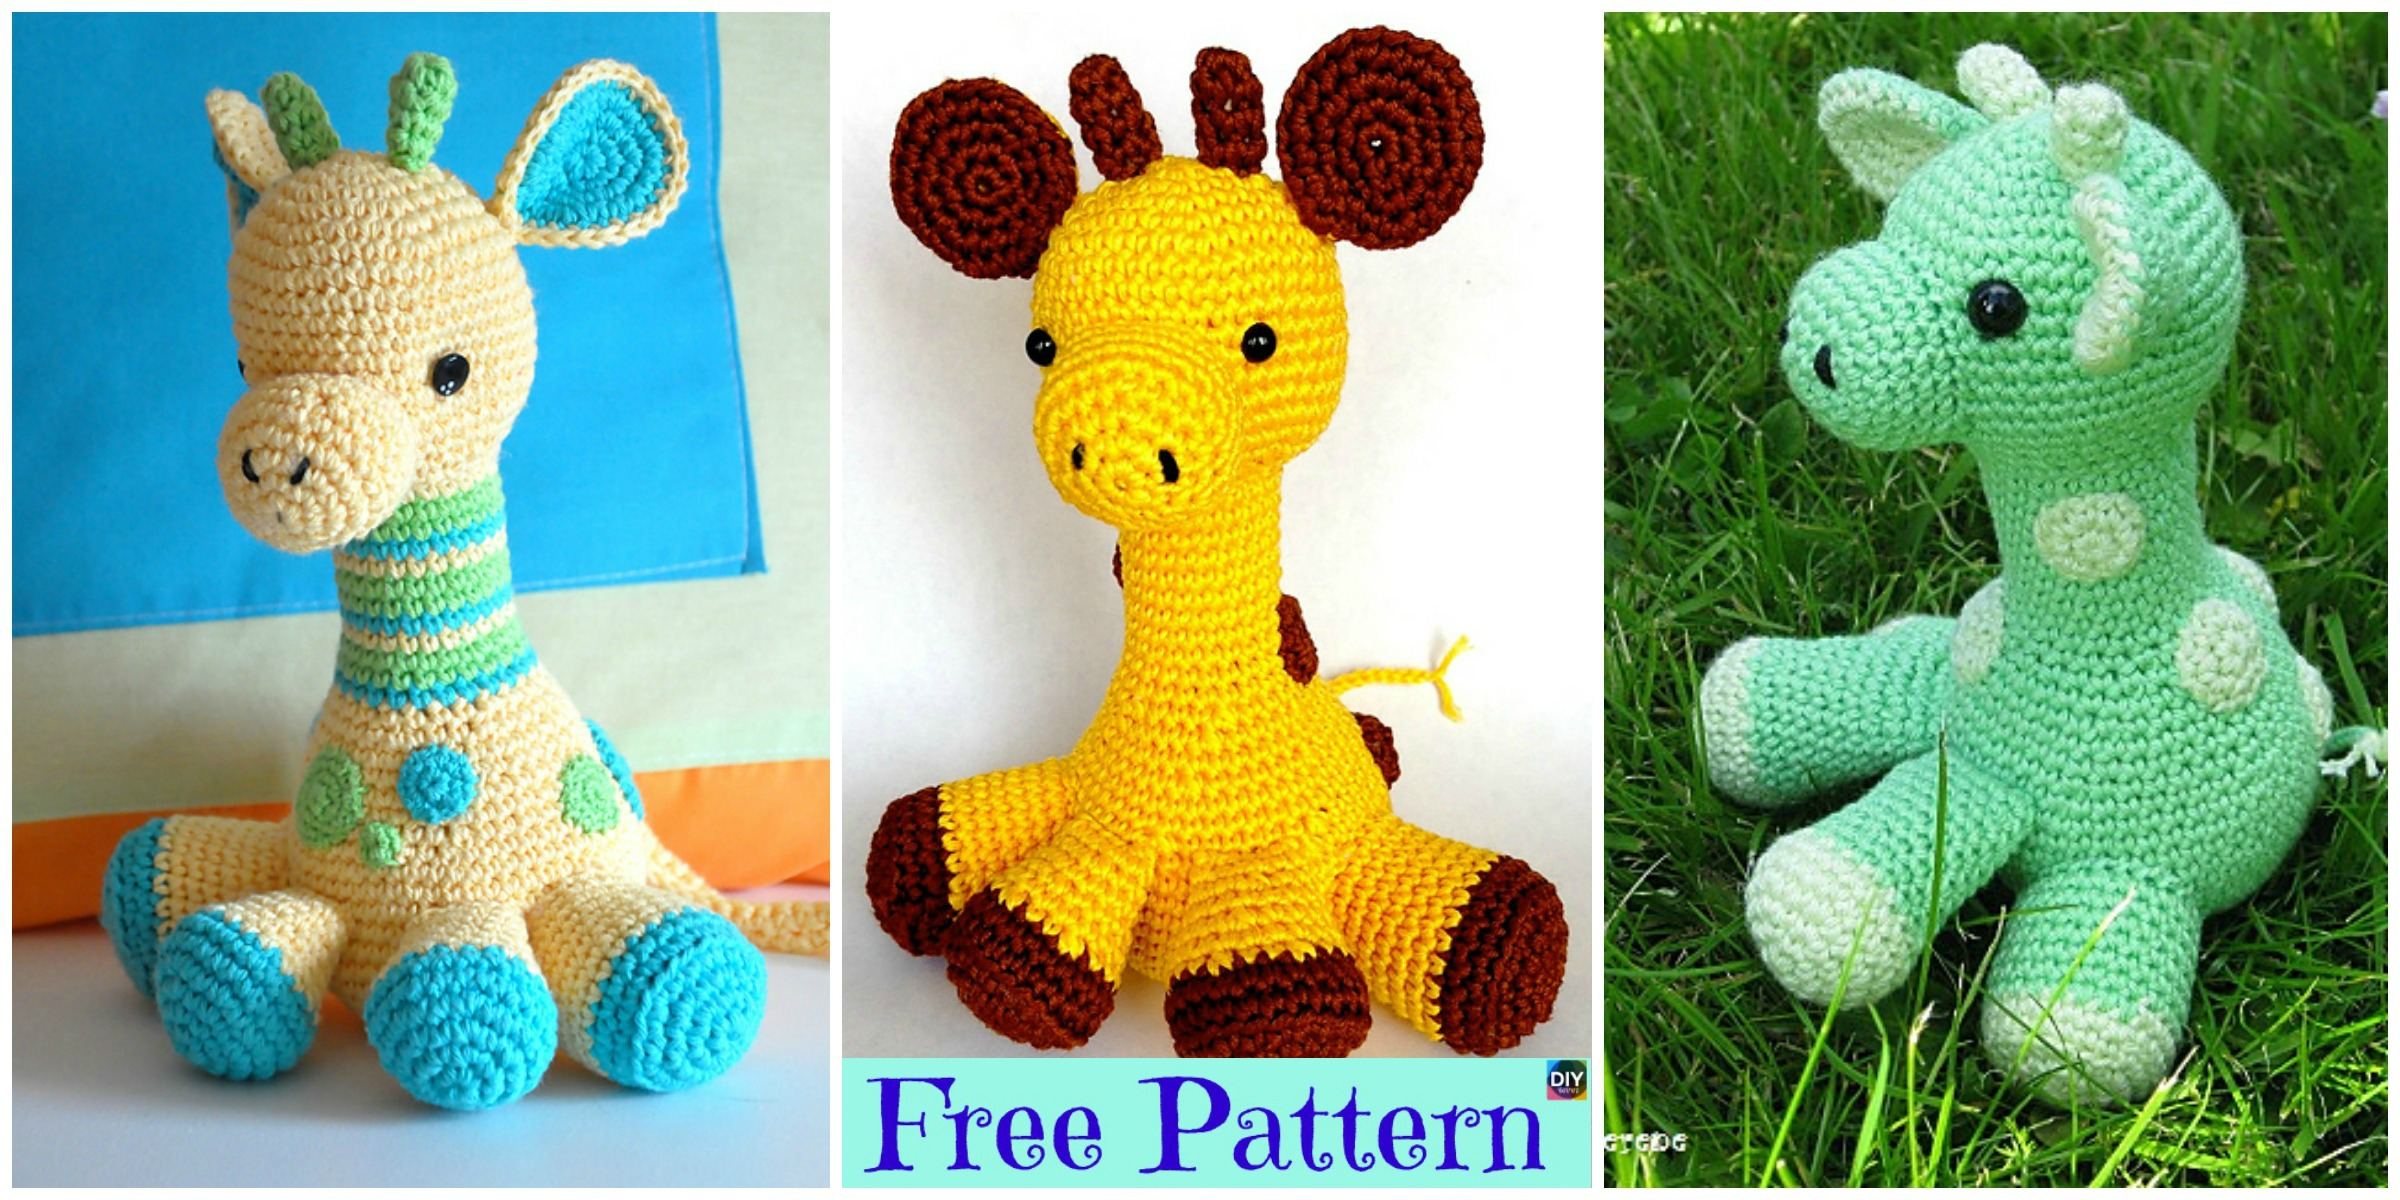 Crochet Baby Giraffe Amigurumi – Free Pattern